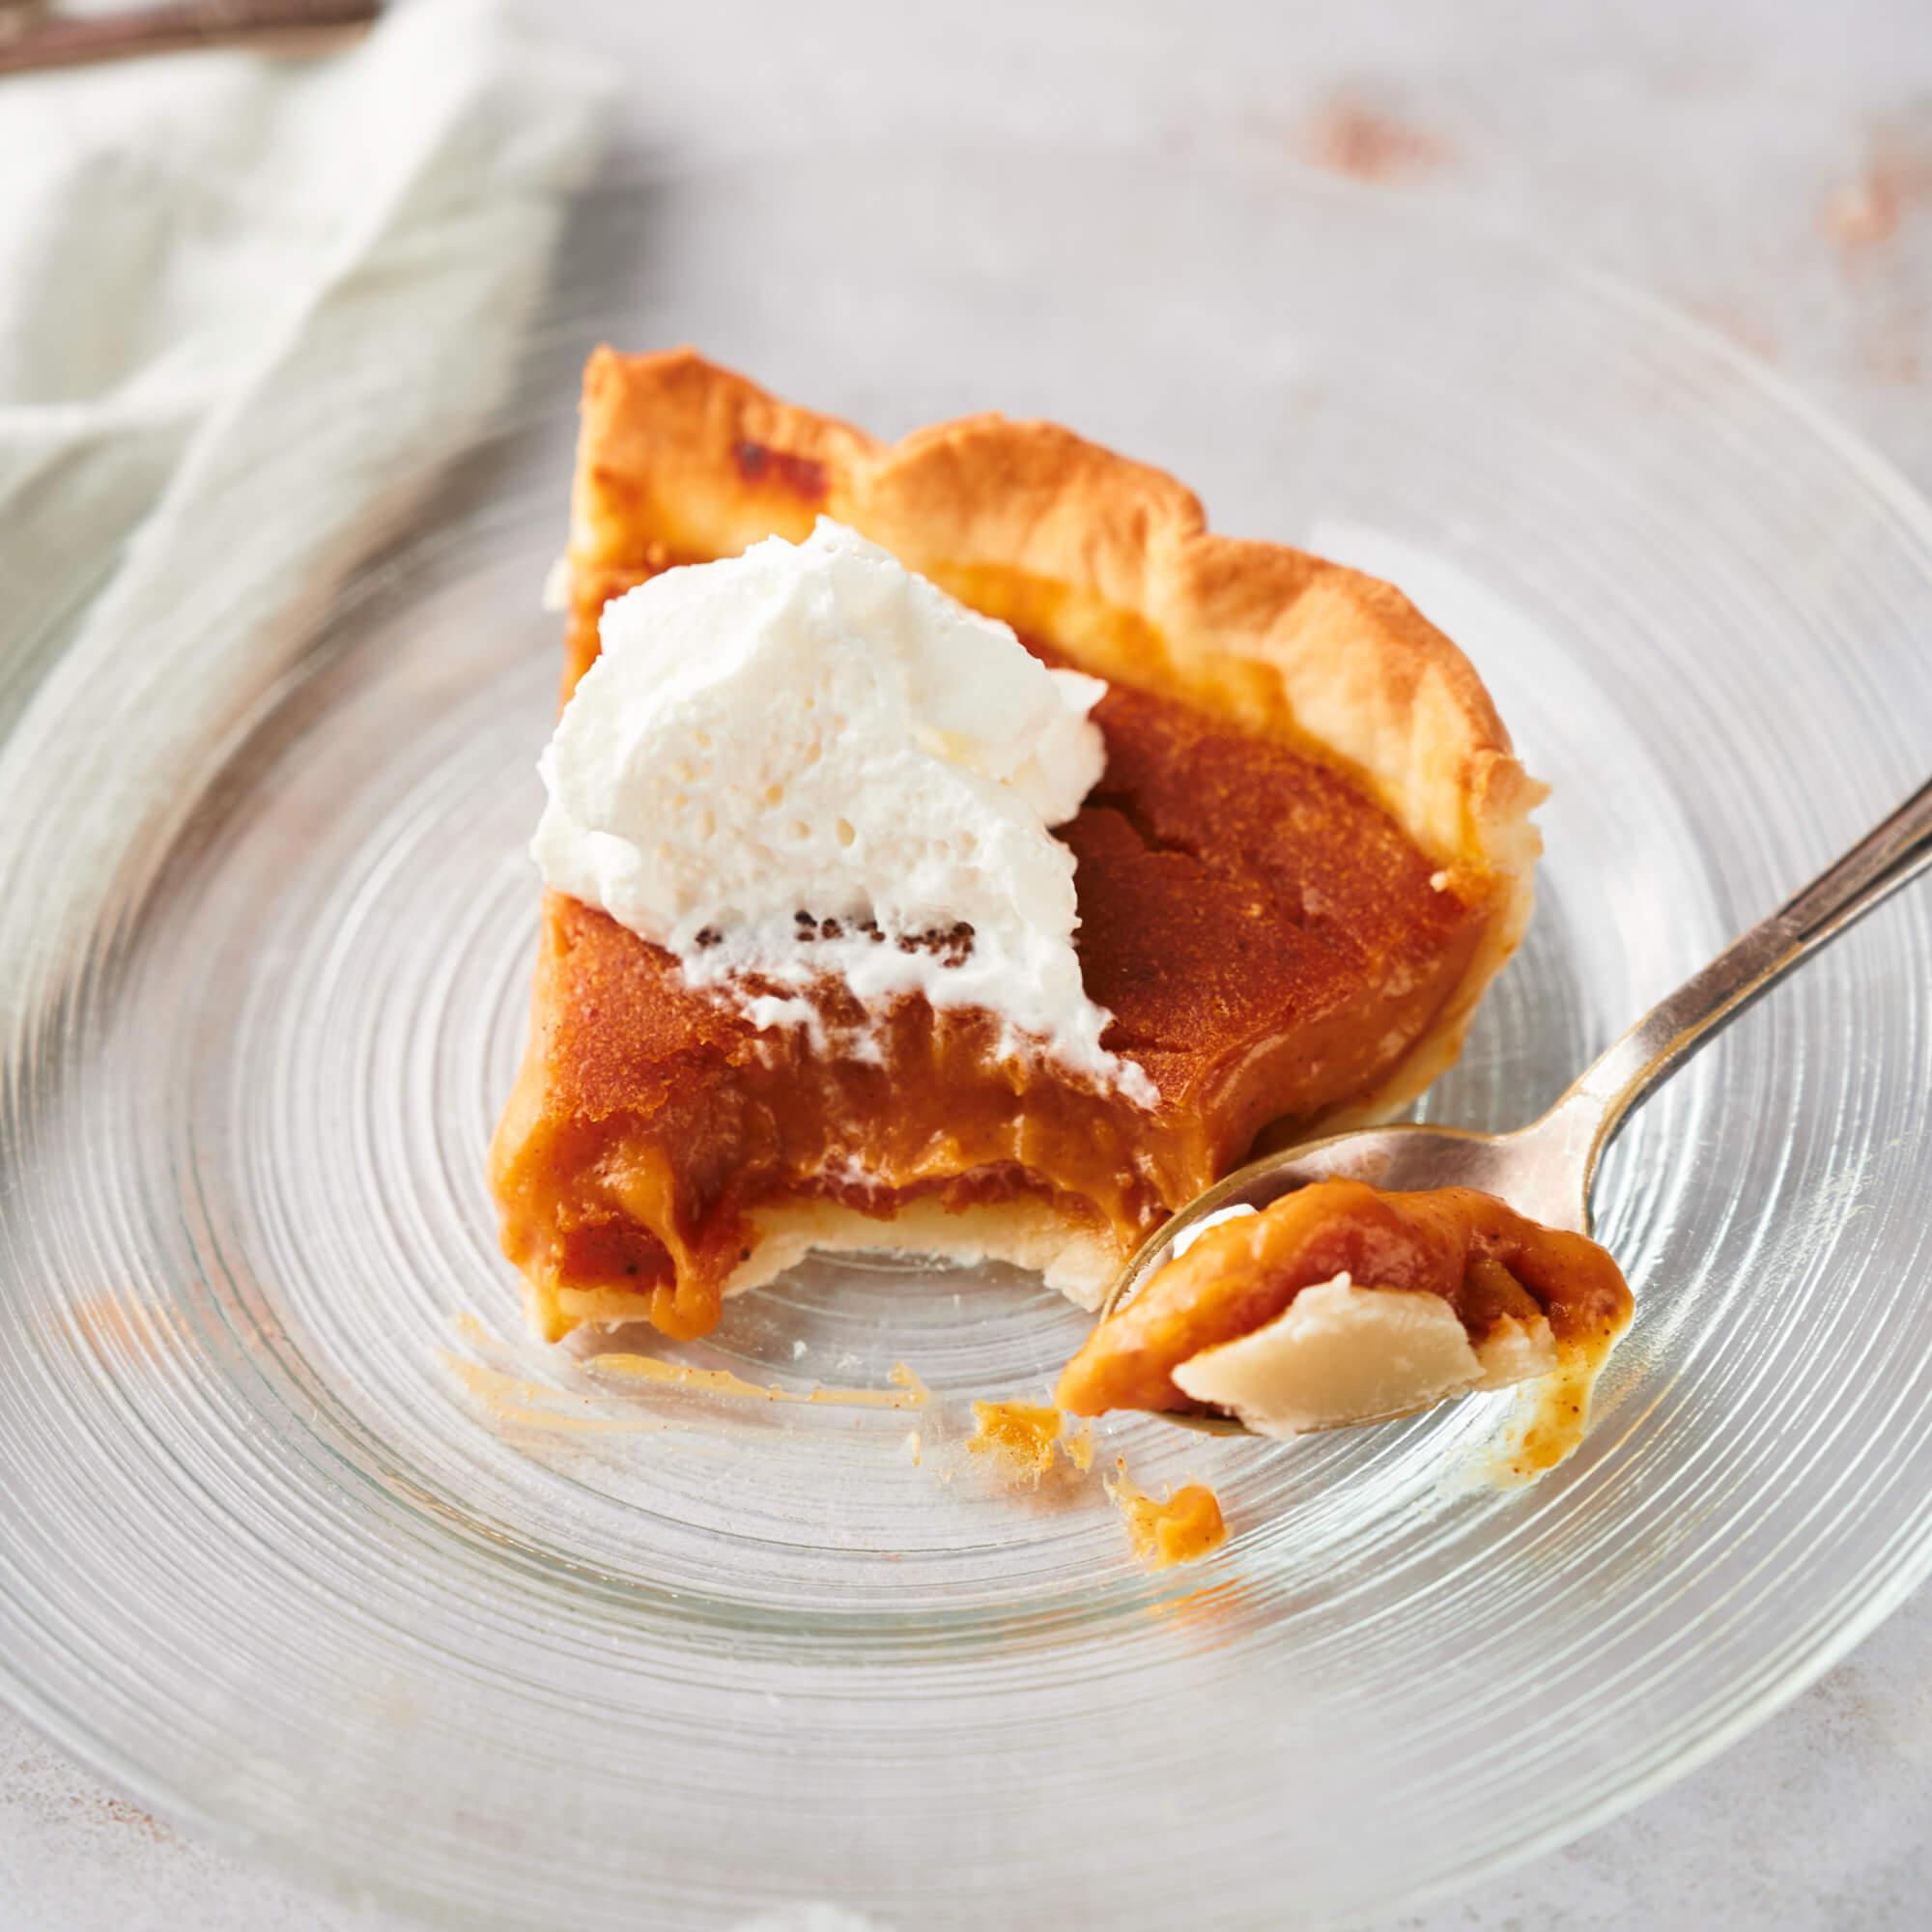 pumpkin pie is one of the 21 Best Vegan Christmas Dinner Recipes